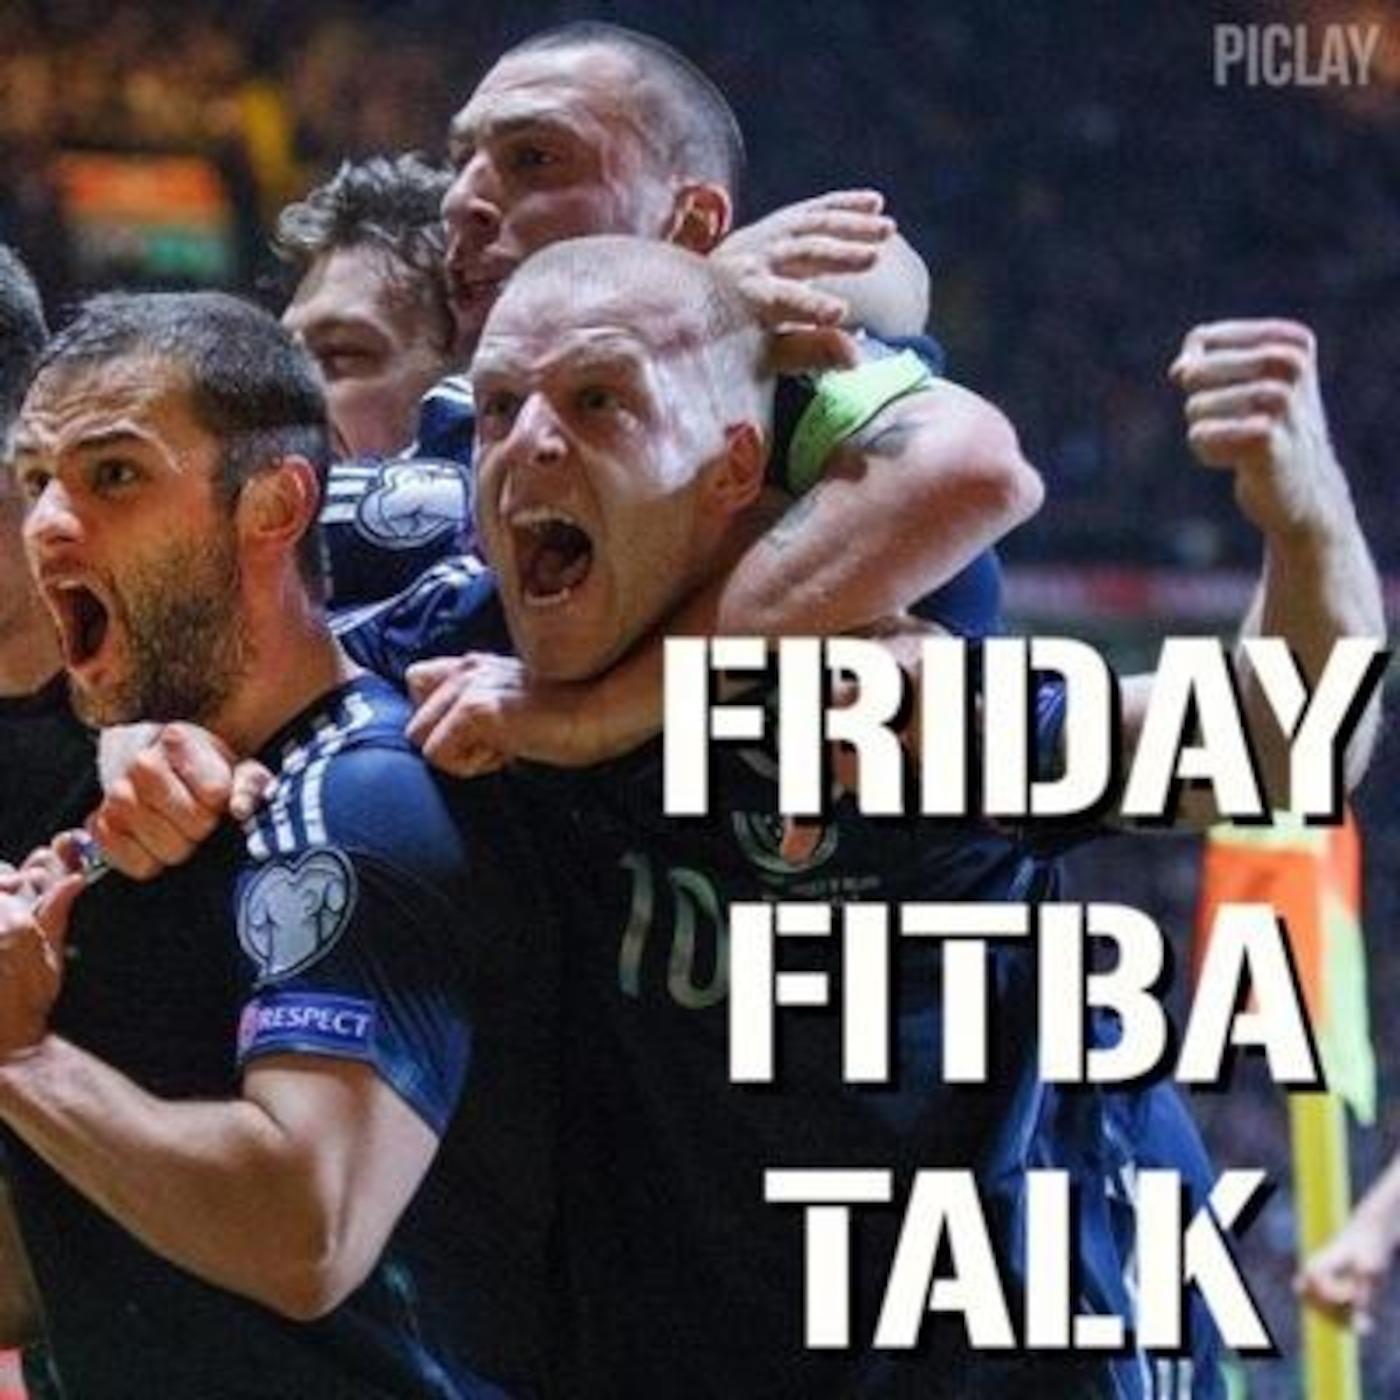 Friday Fitba Talk